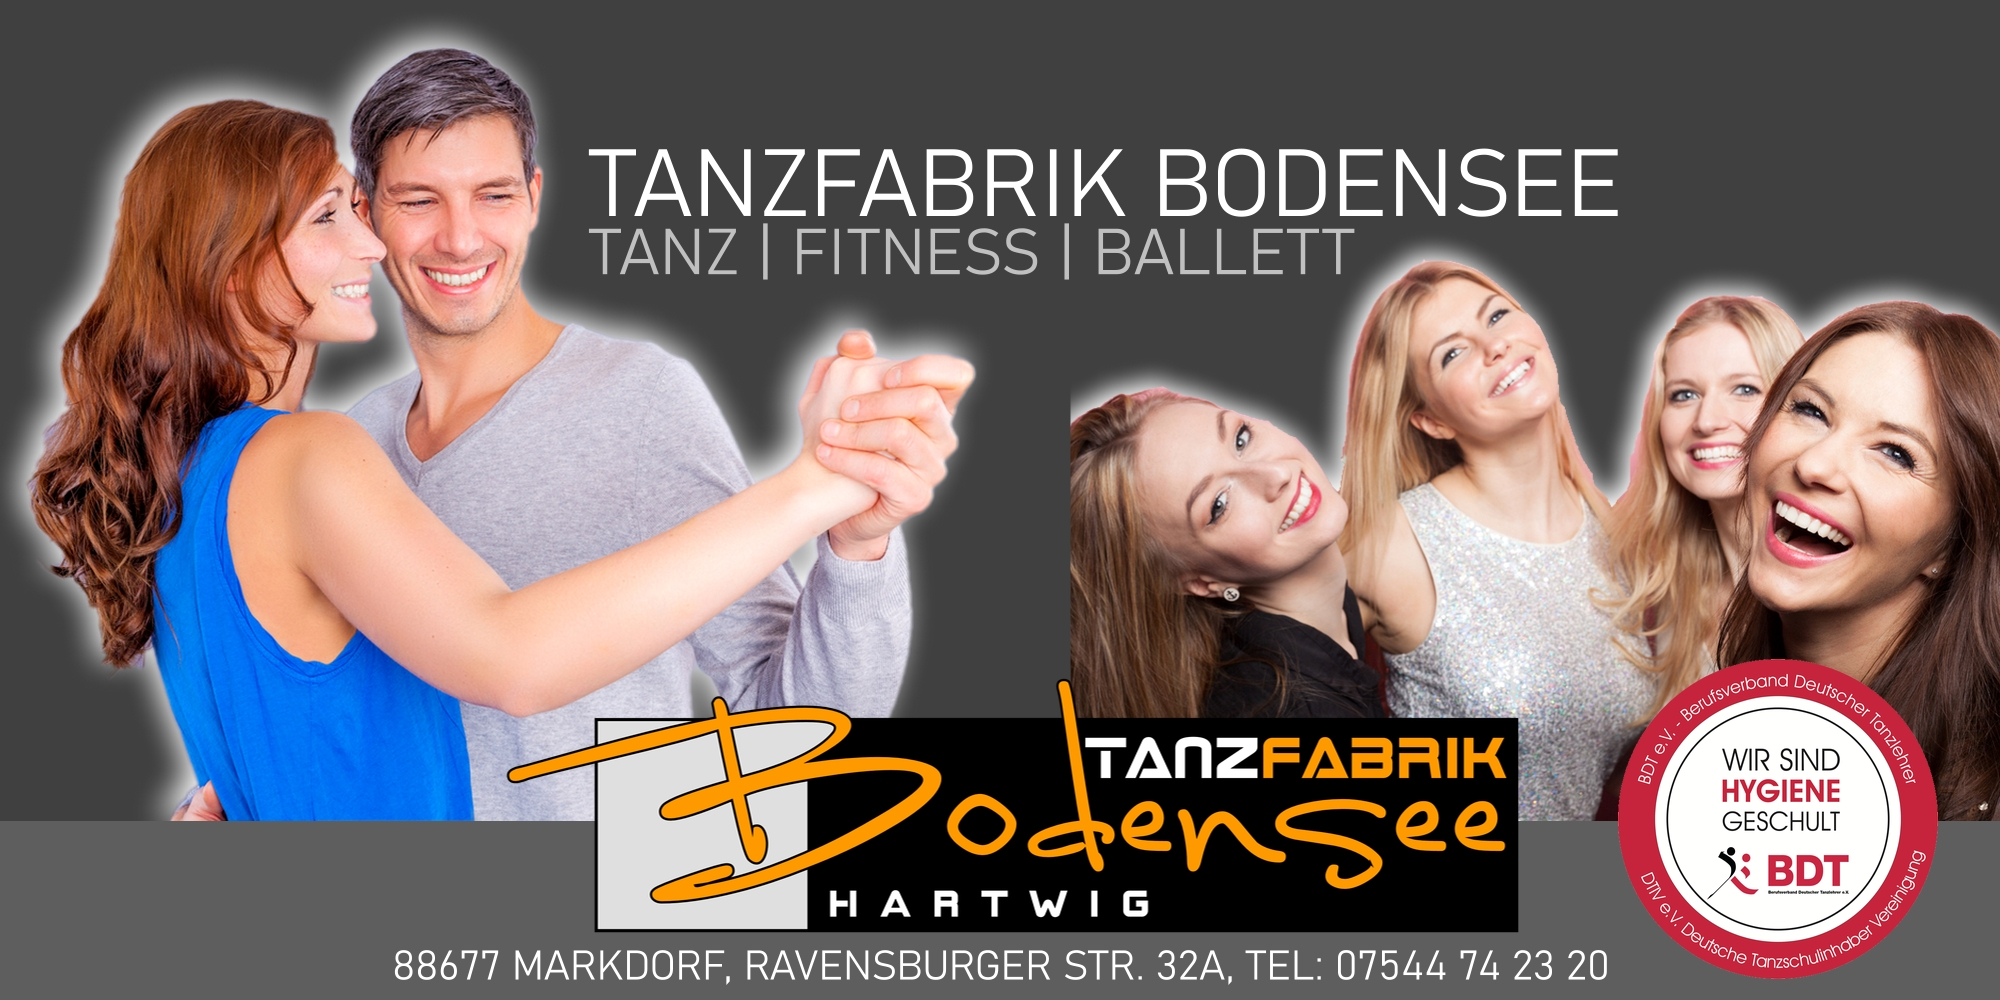 Tanzschule Tanzfabrik Bodensee